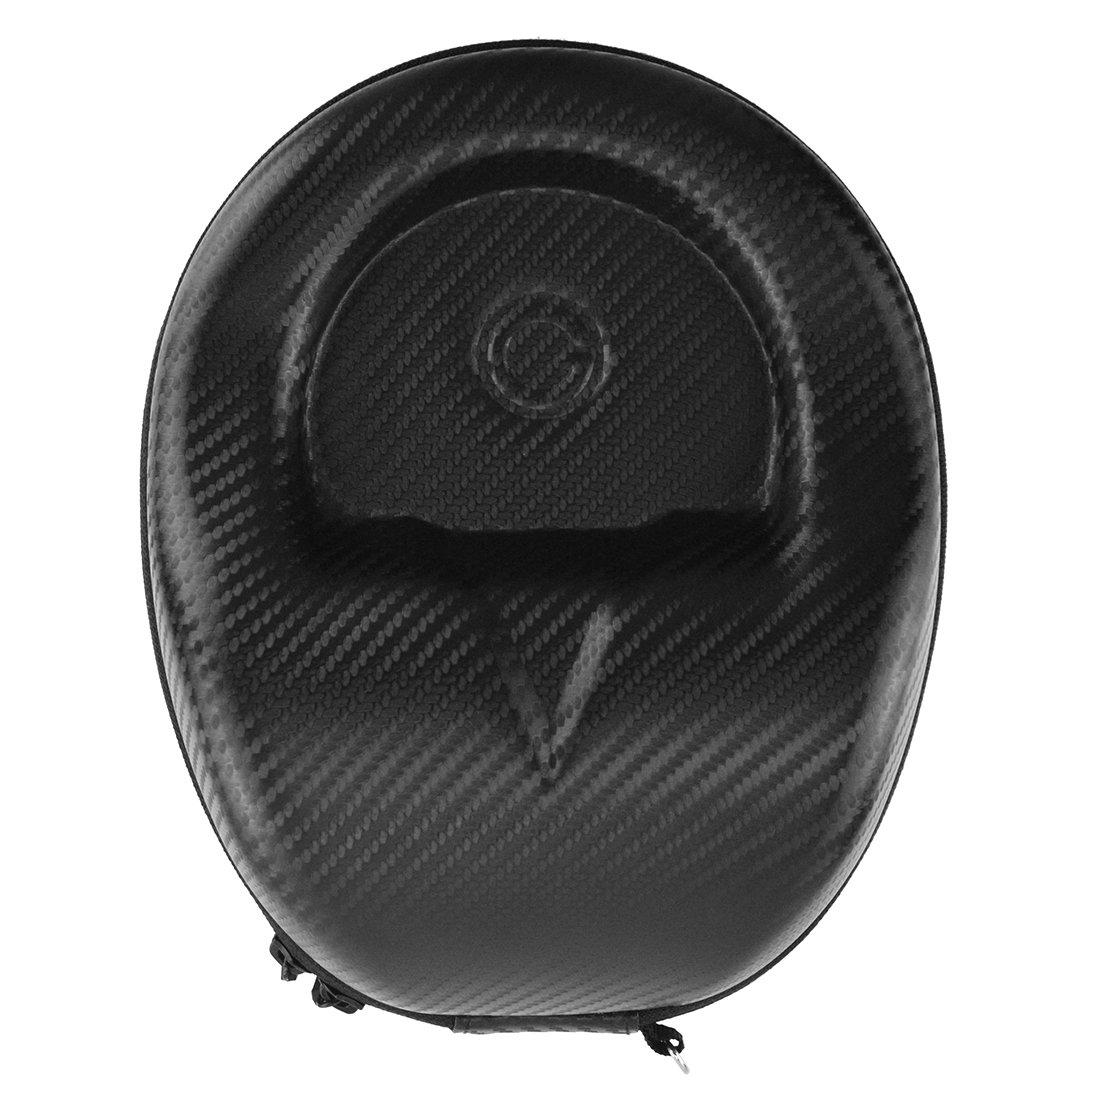 Geekria ejb63 Ultrashell auriculares funda/carcasa rígida funda de transporte/Auriculares bolsa de viaje protectora para auriculares Sennheiser HD598 CS, ...